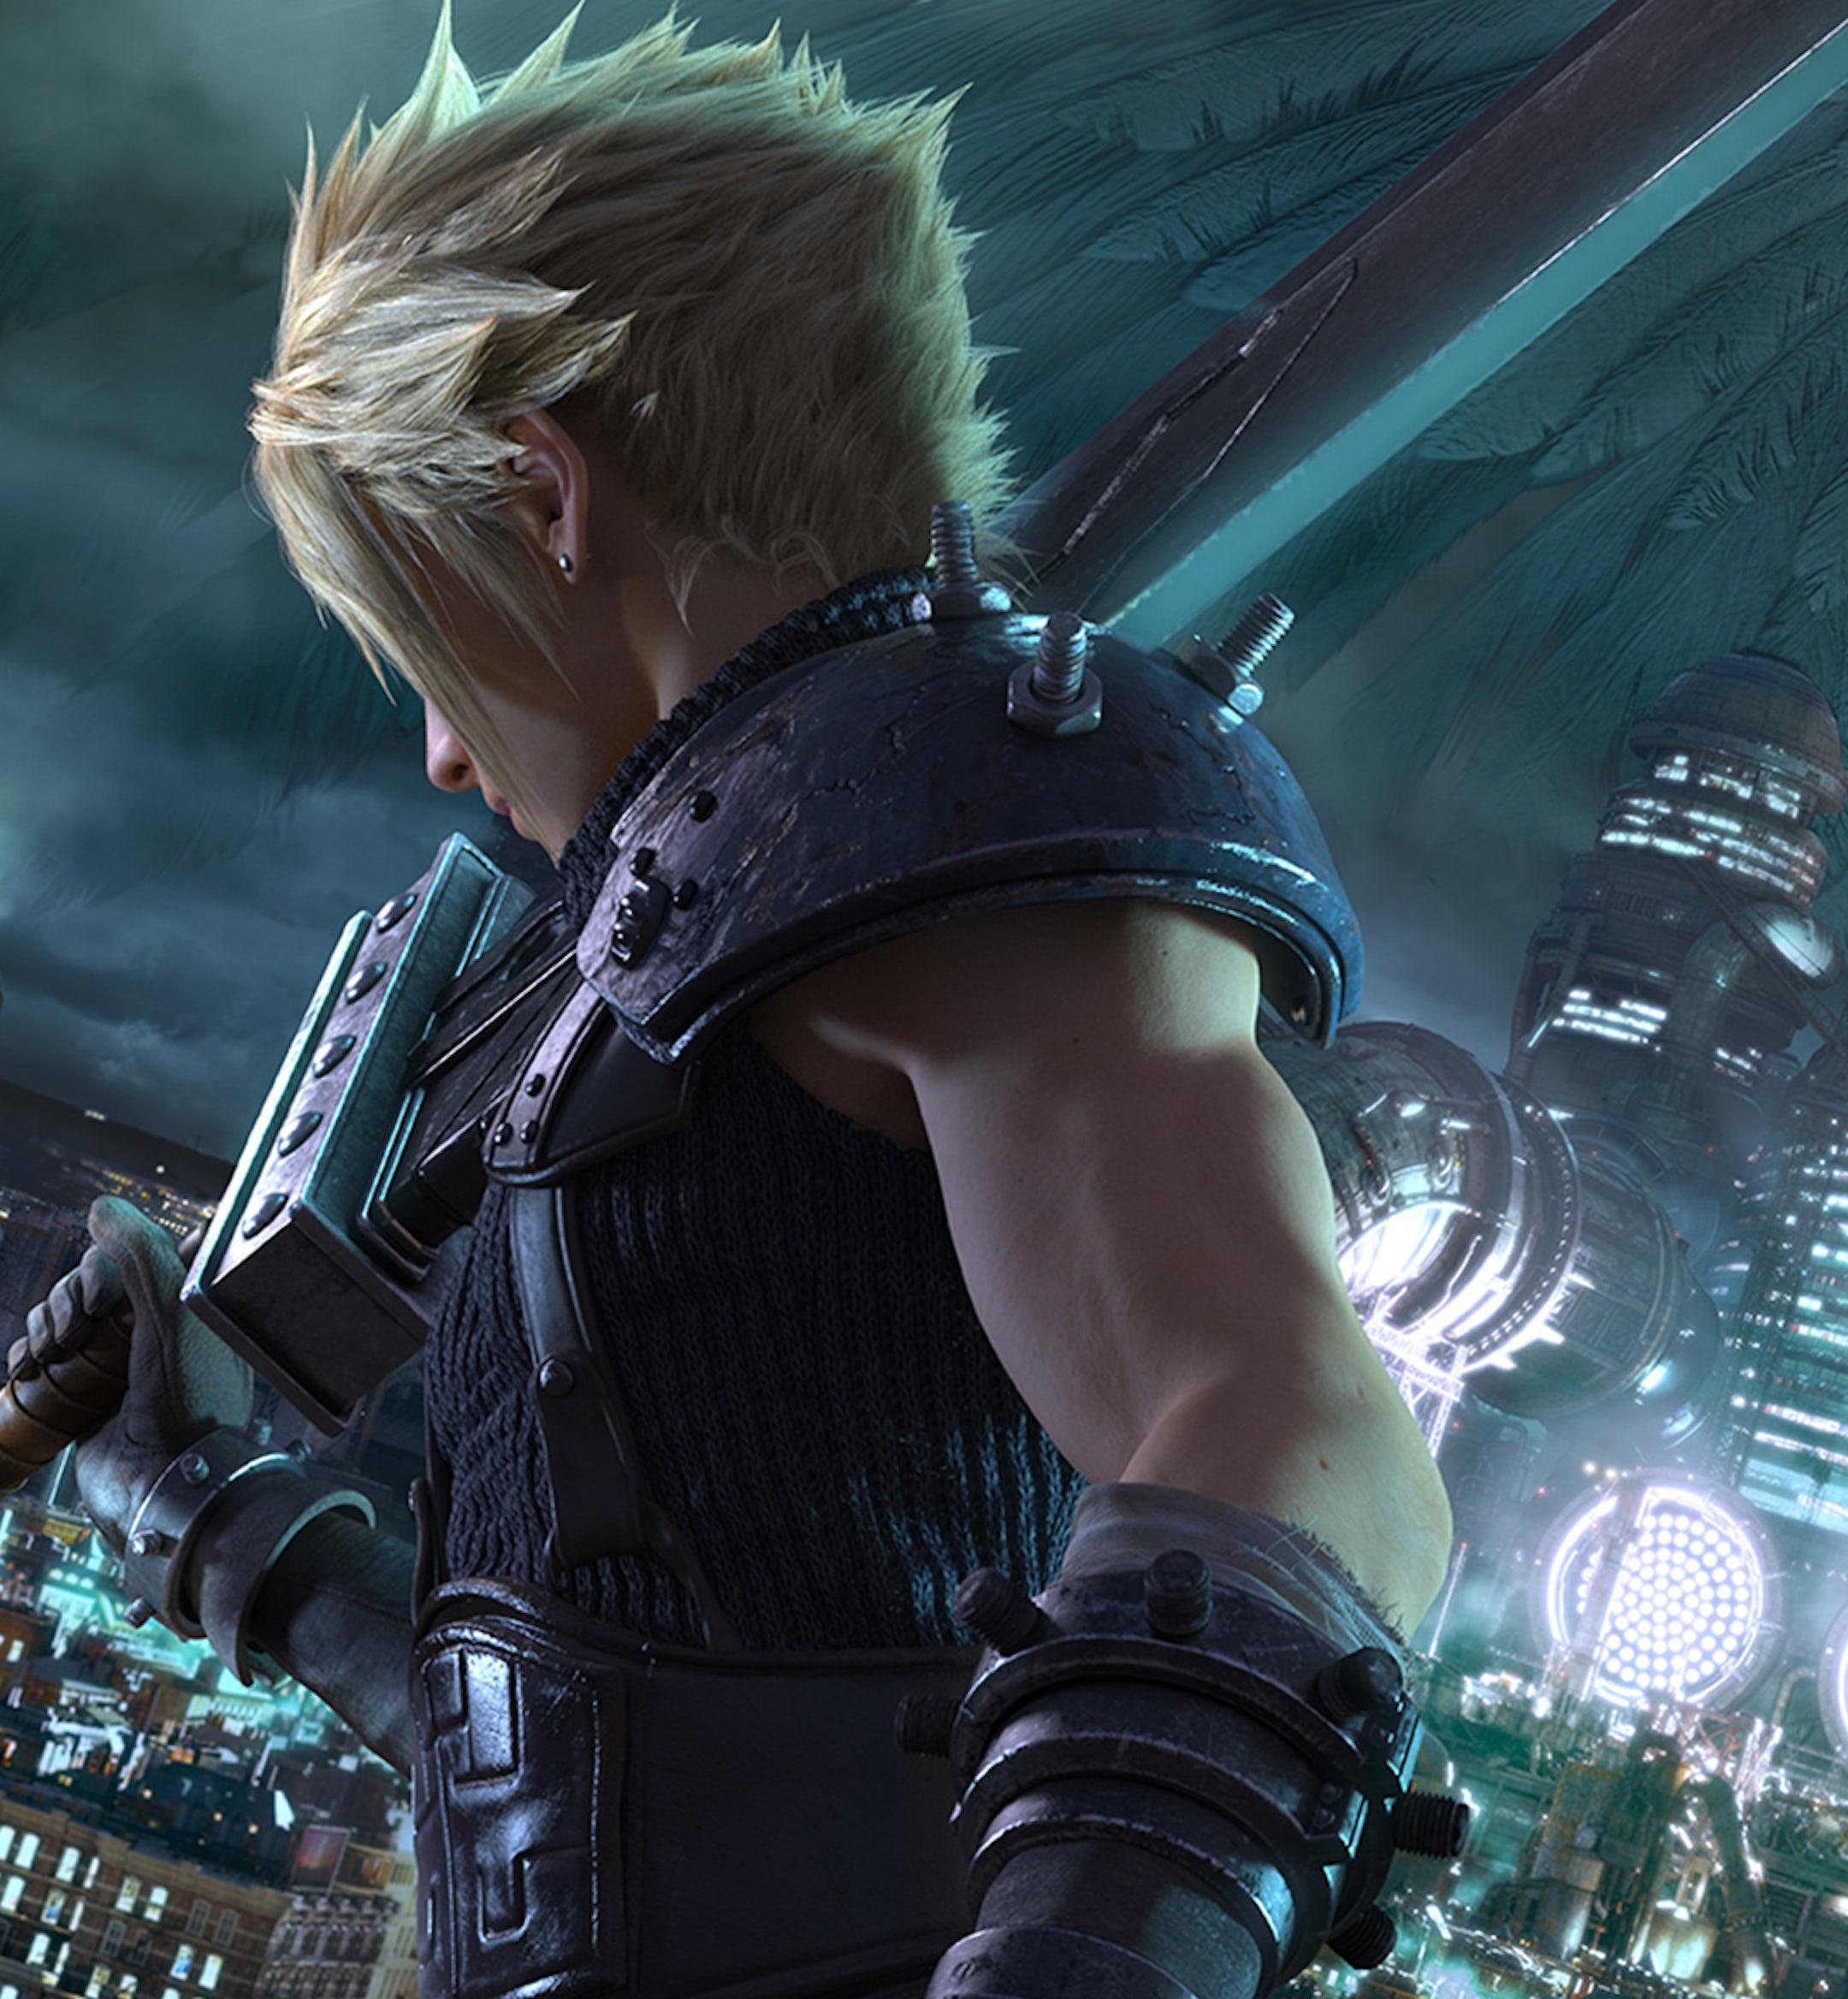 E3 Final Fantasy VII Remake mobile